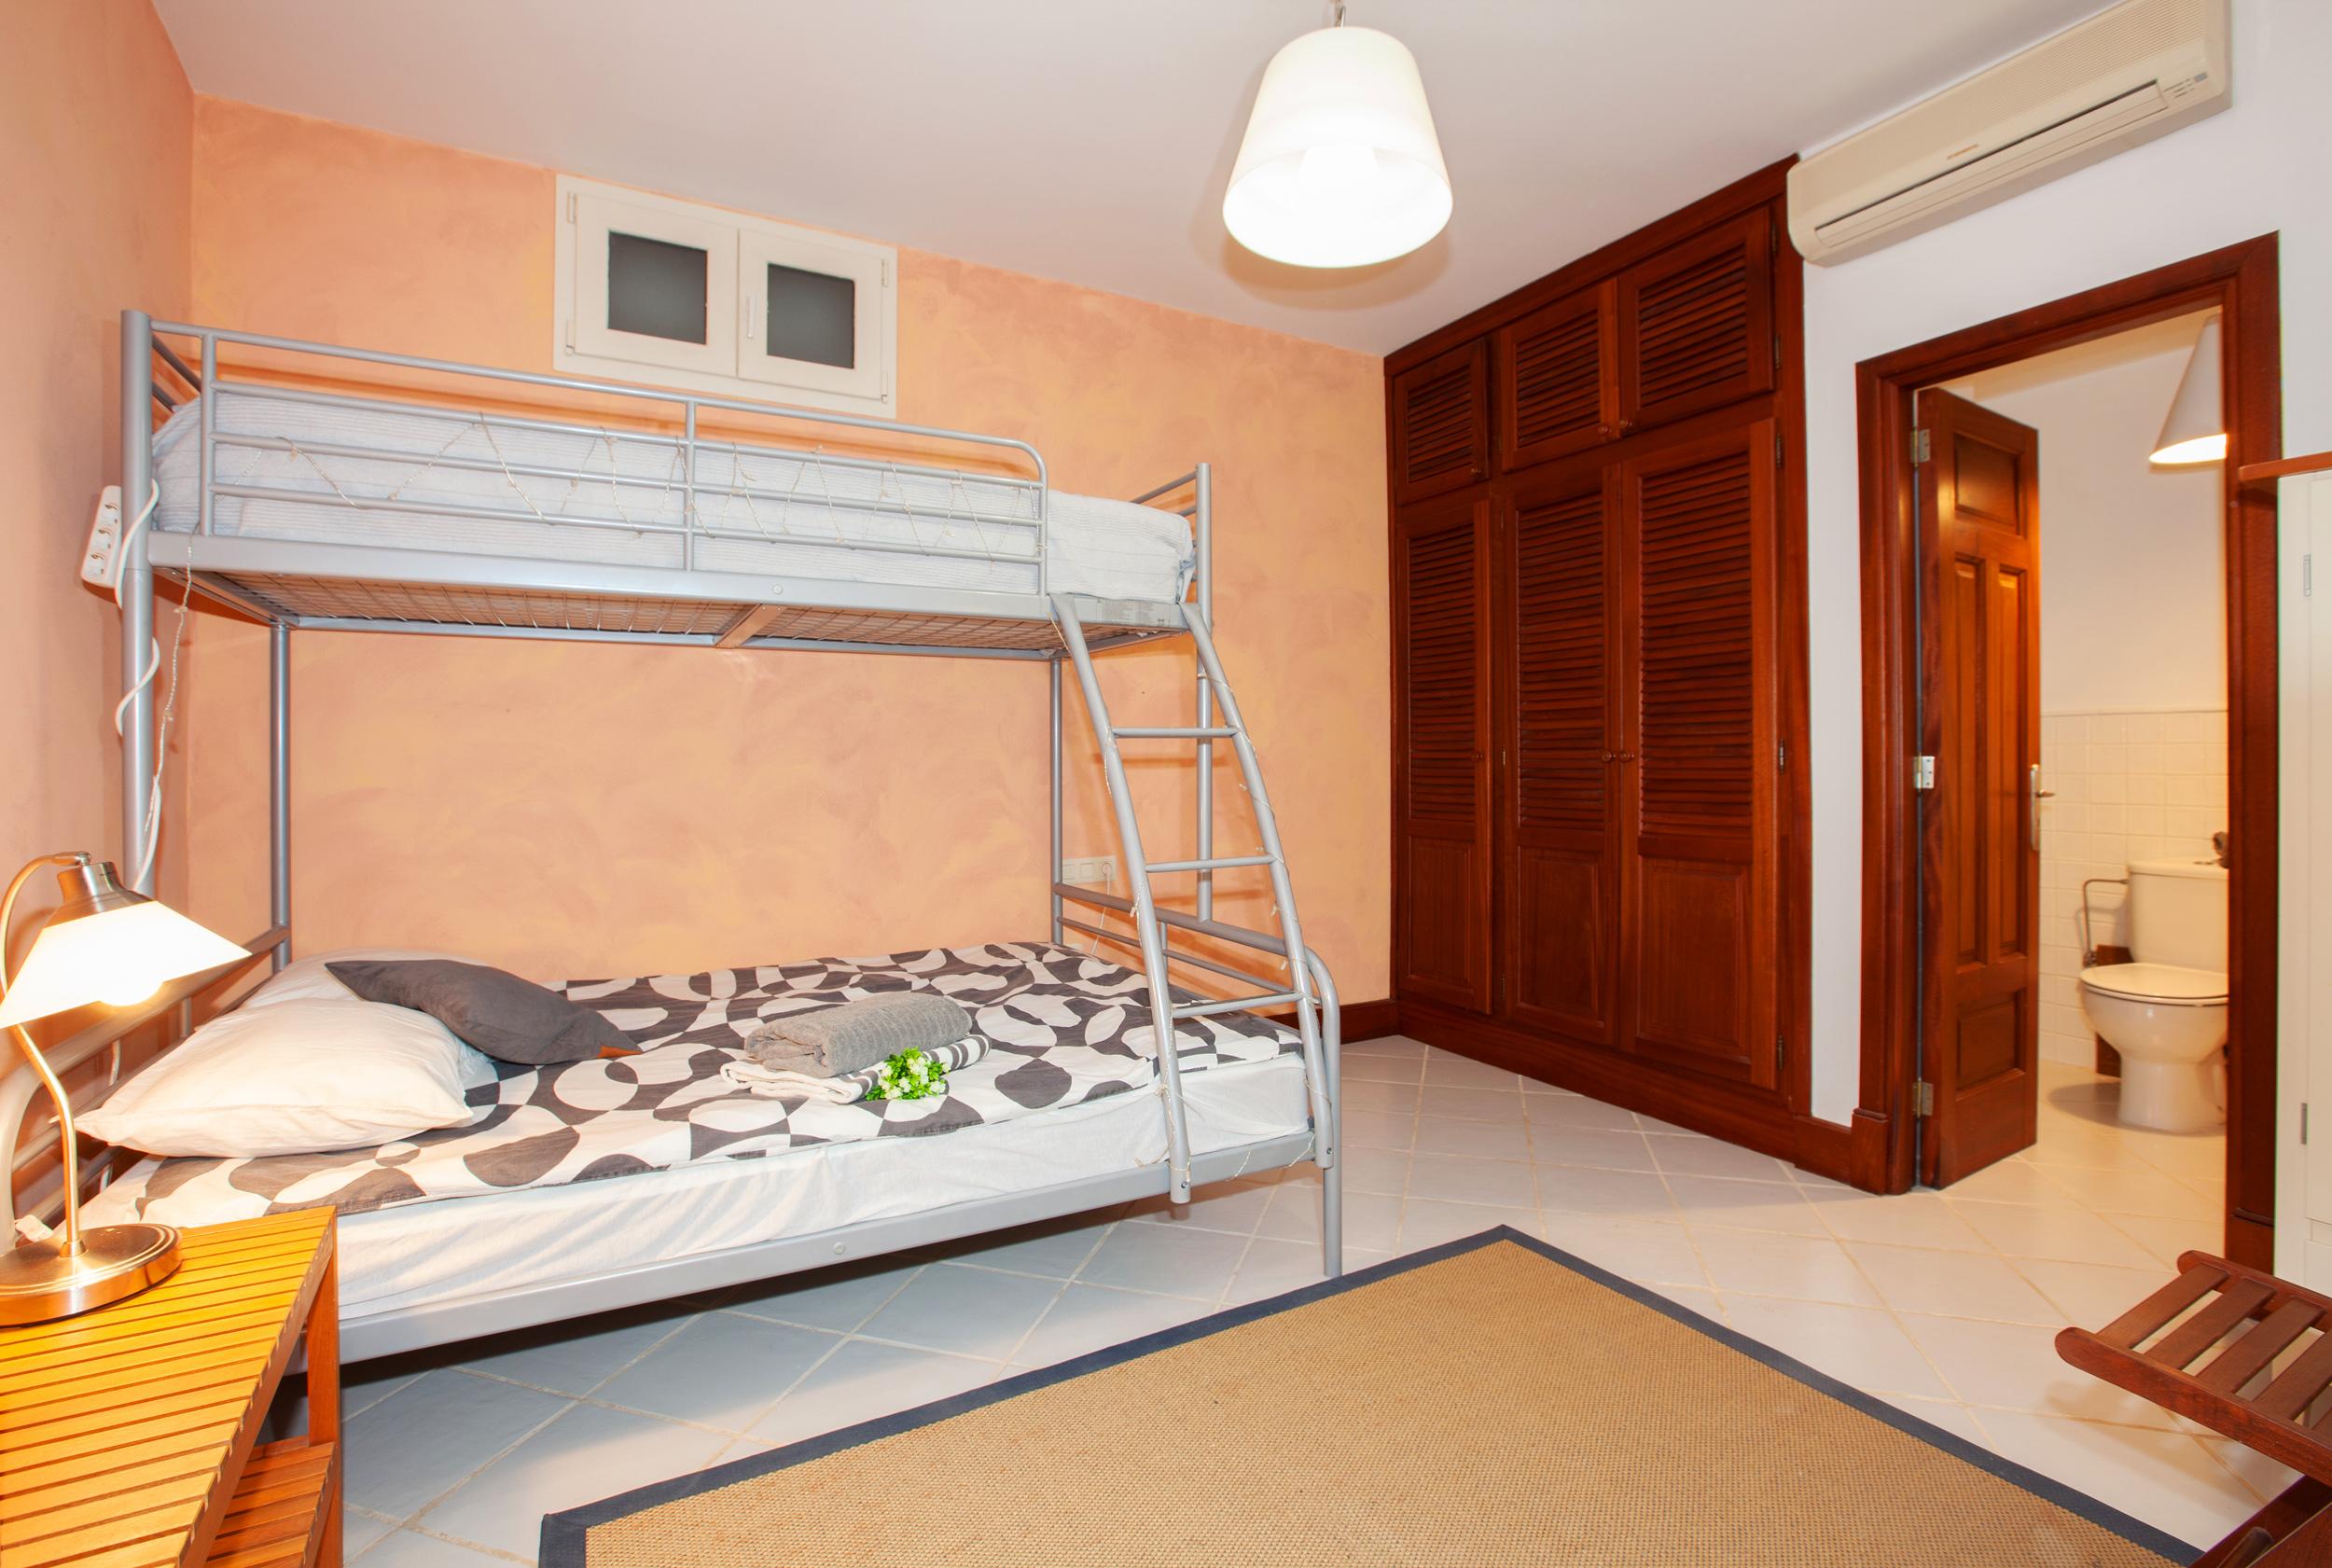 LVC311041 downstairs bedroom